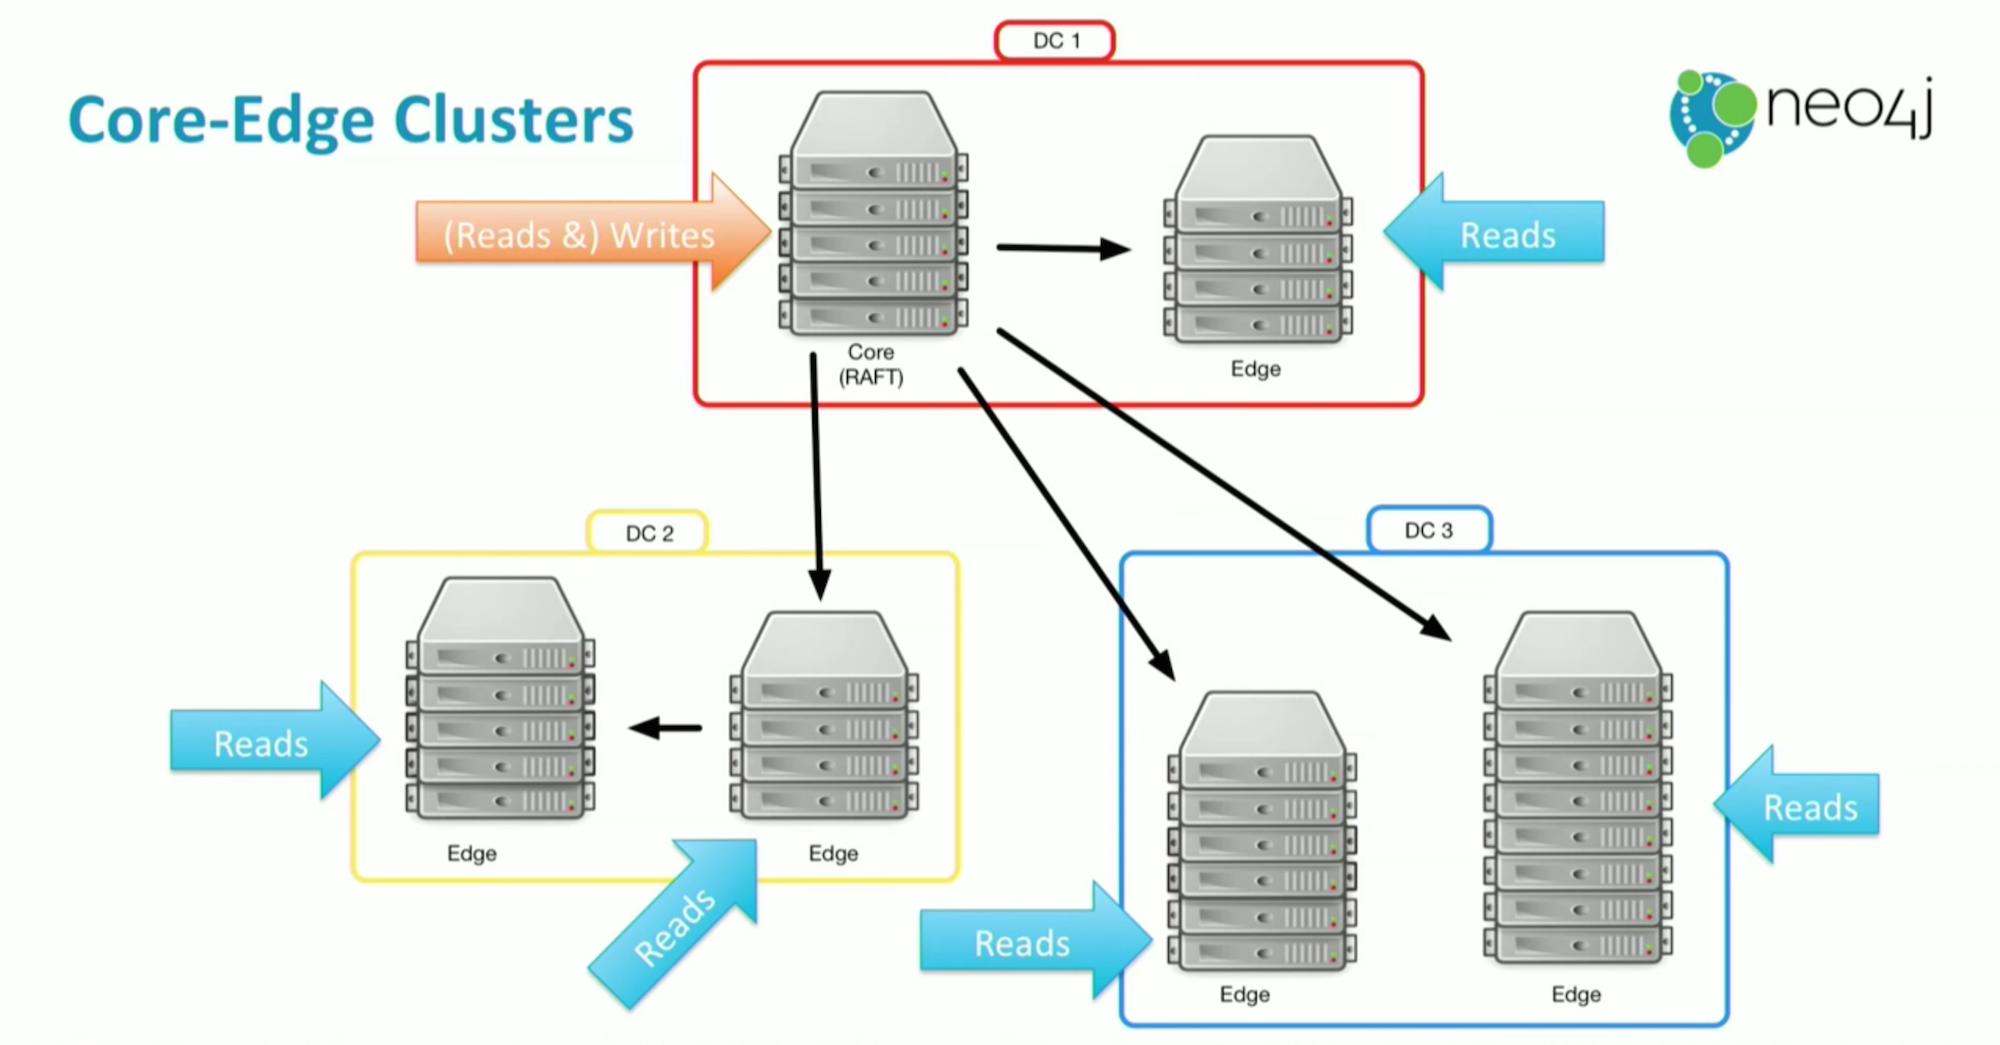 Neo4j Core-Edge Clusters